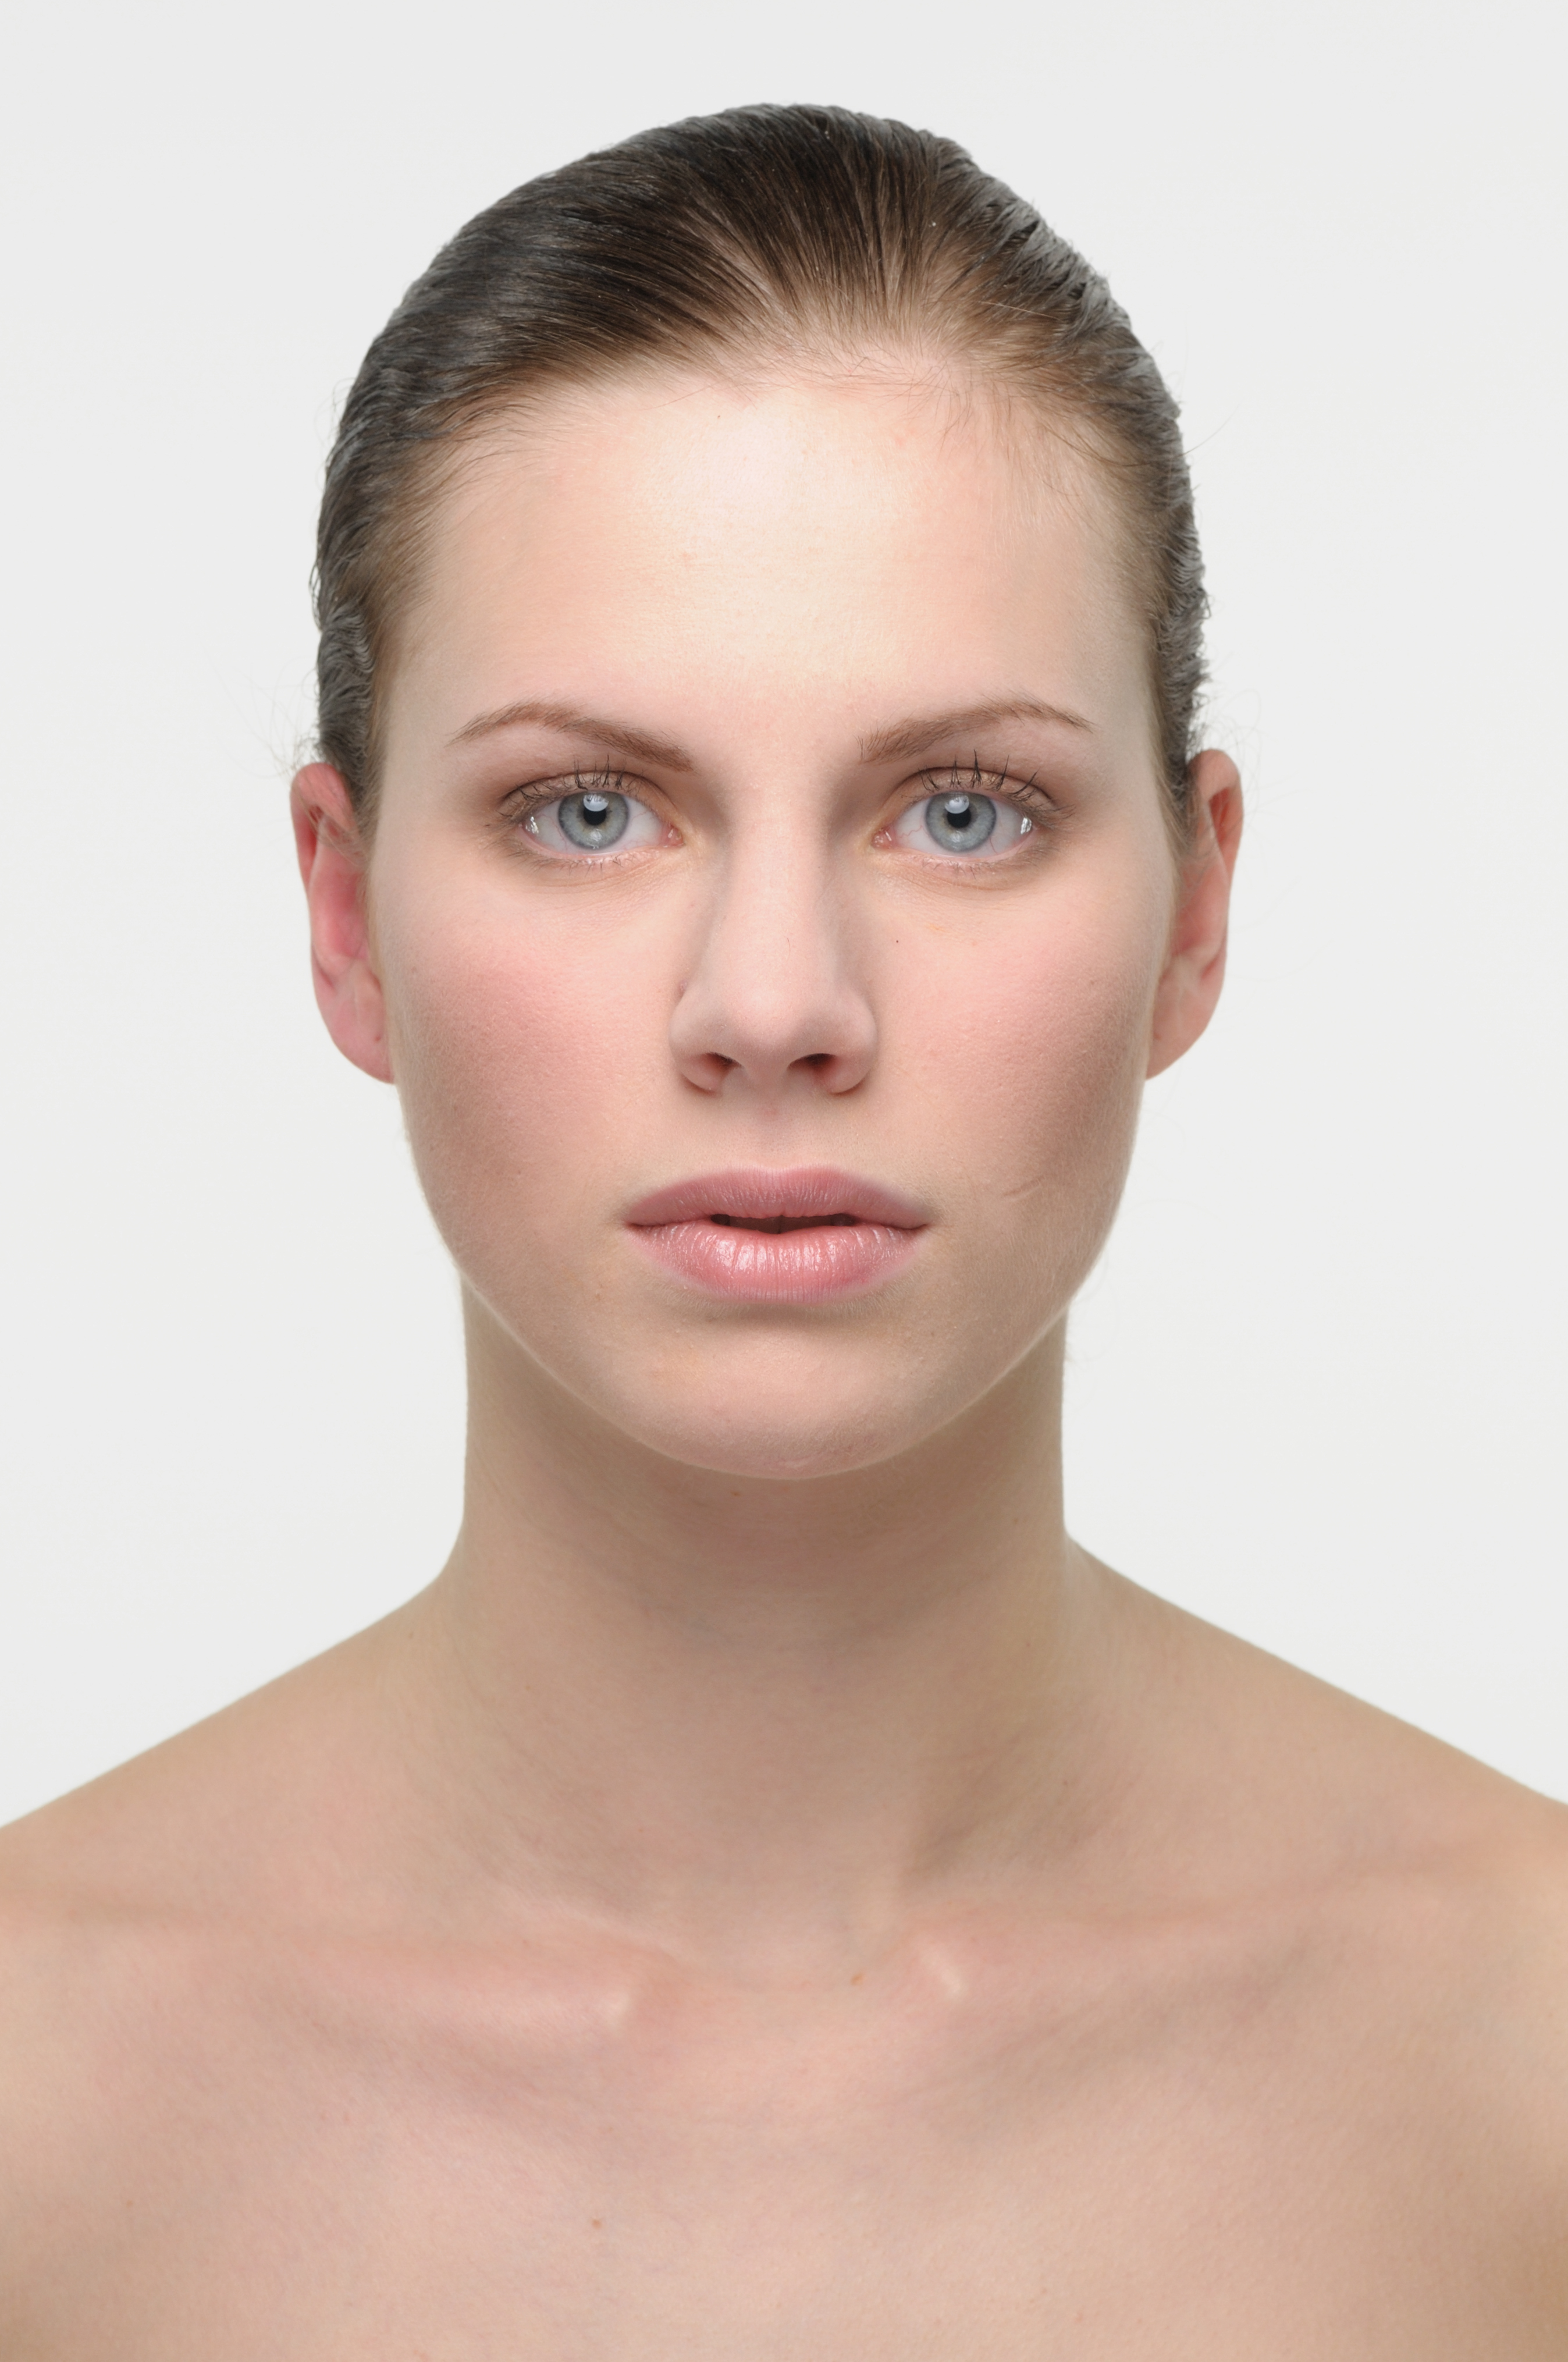 Face]